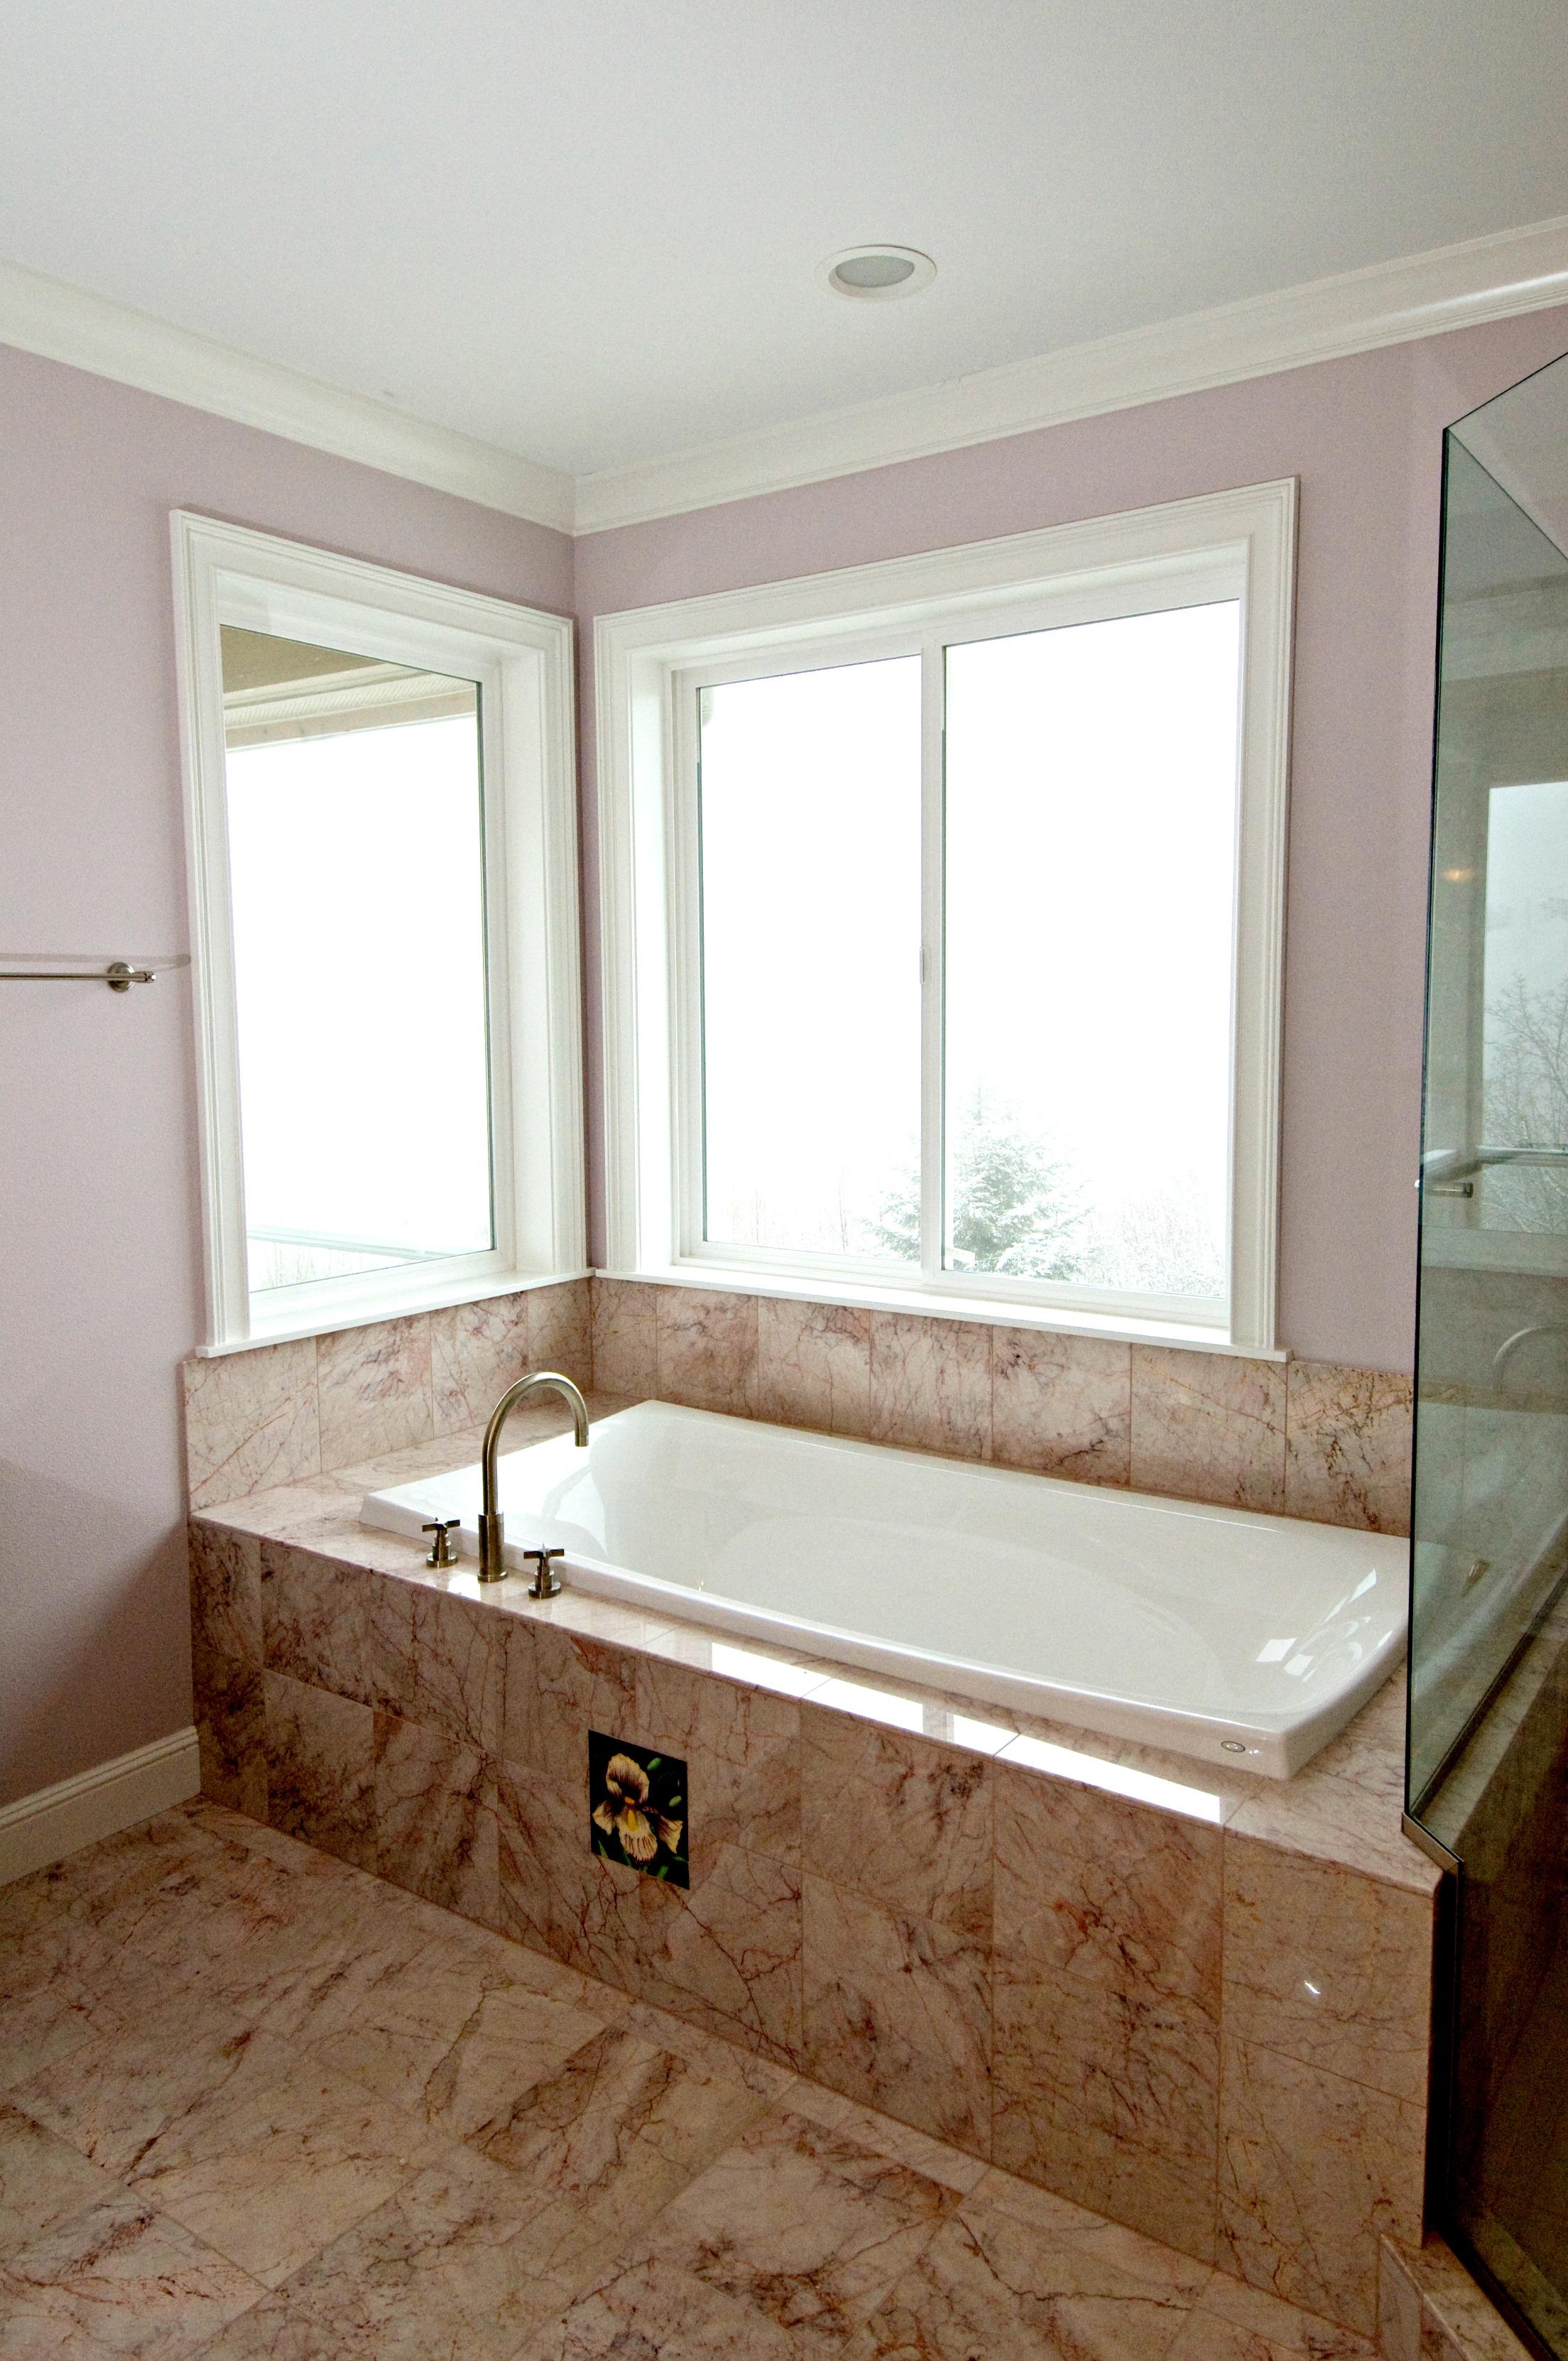 Washougal, Washington - Skamania County, Washington - Build On Your Lot - Single Family Home